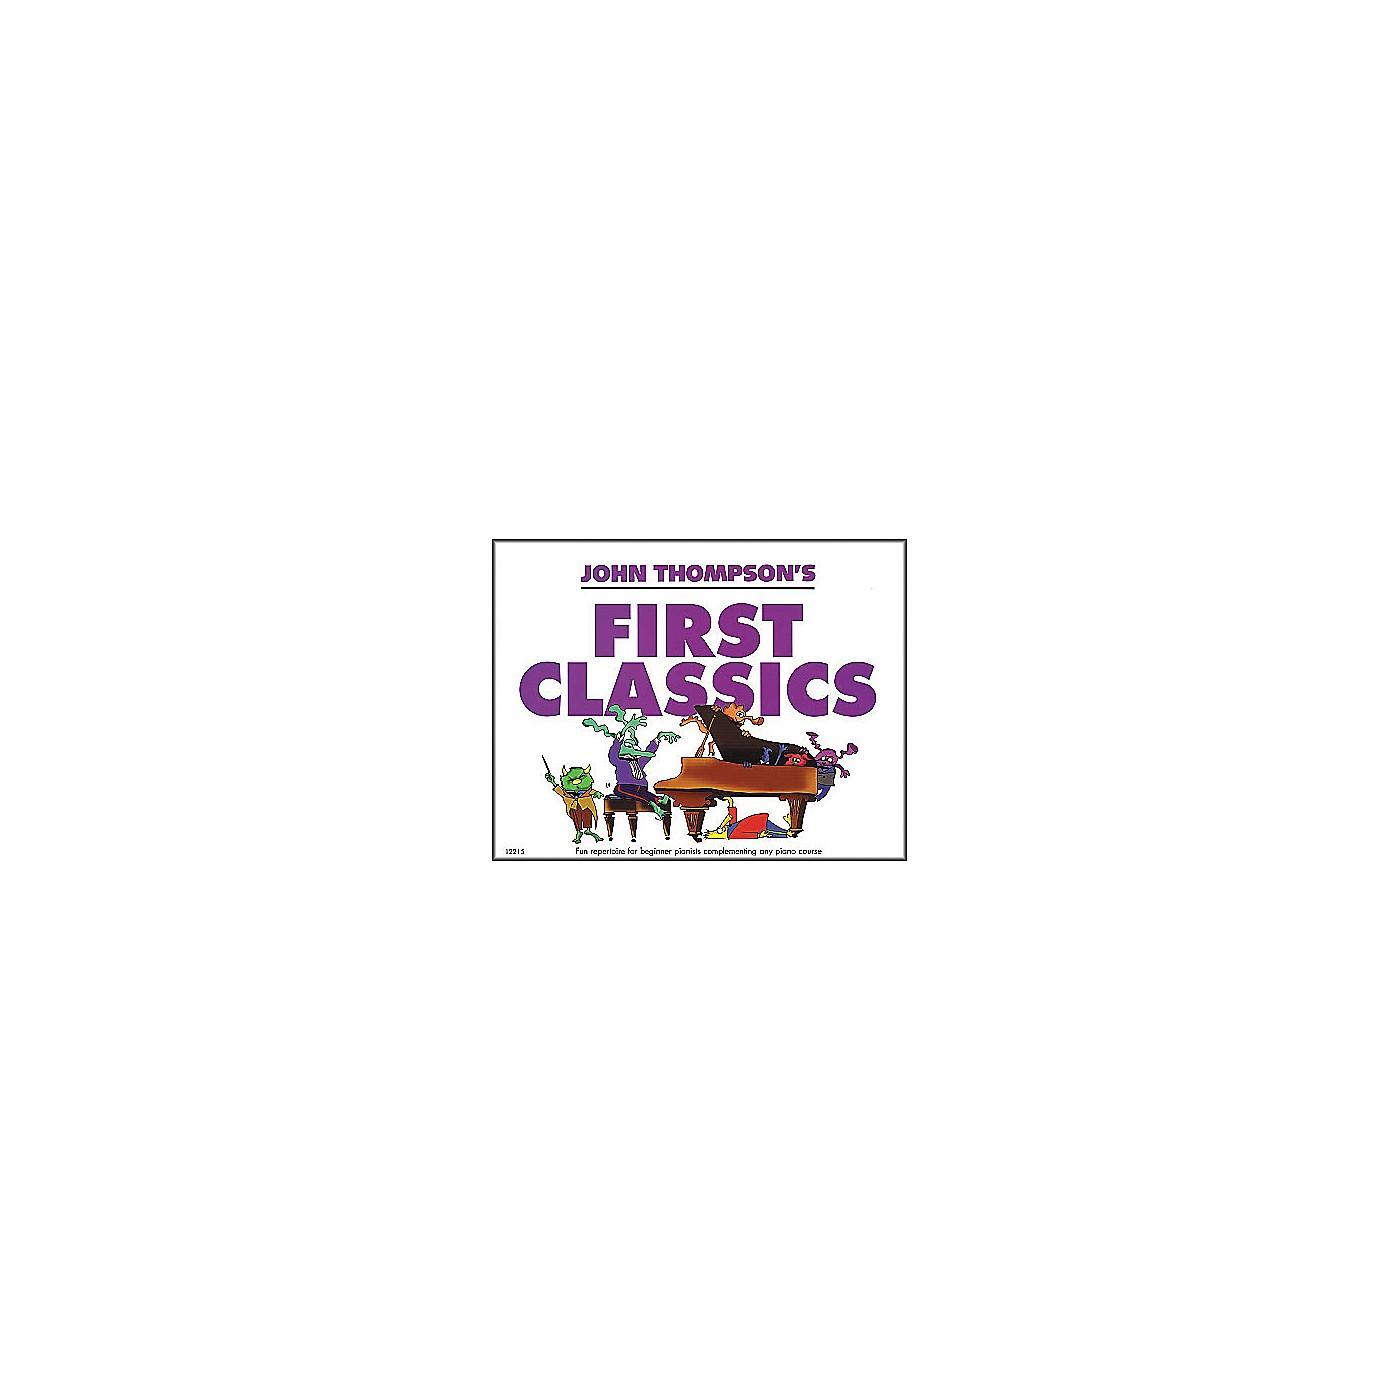 Willis Music John Thompson's First Classics Late Elementary Level for Piano thumbnail